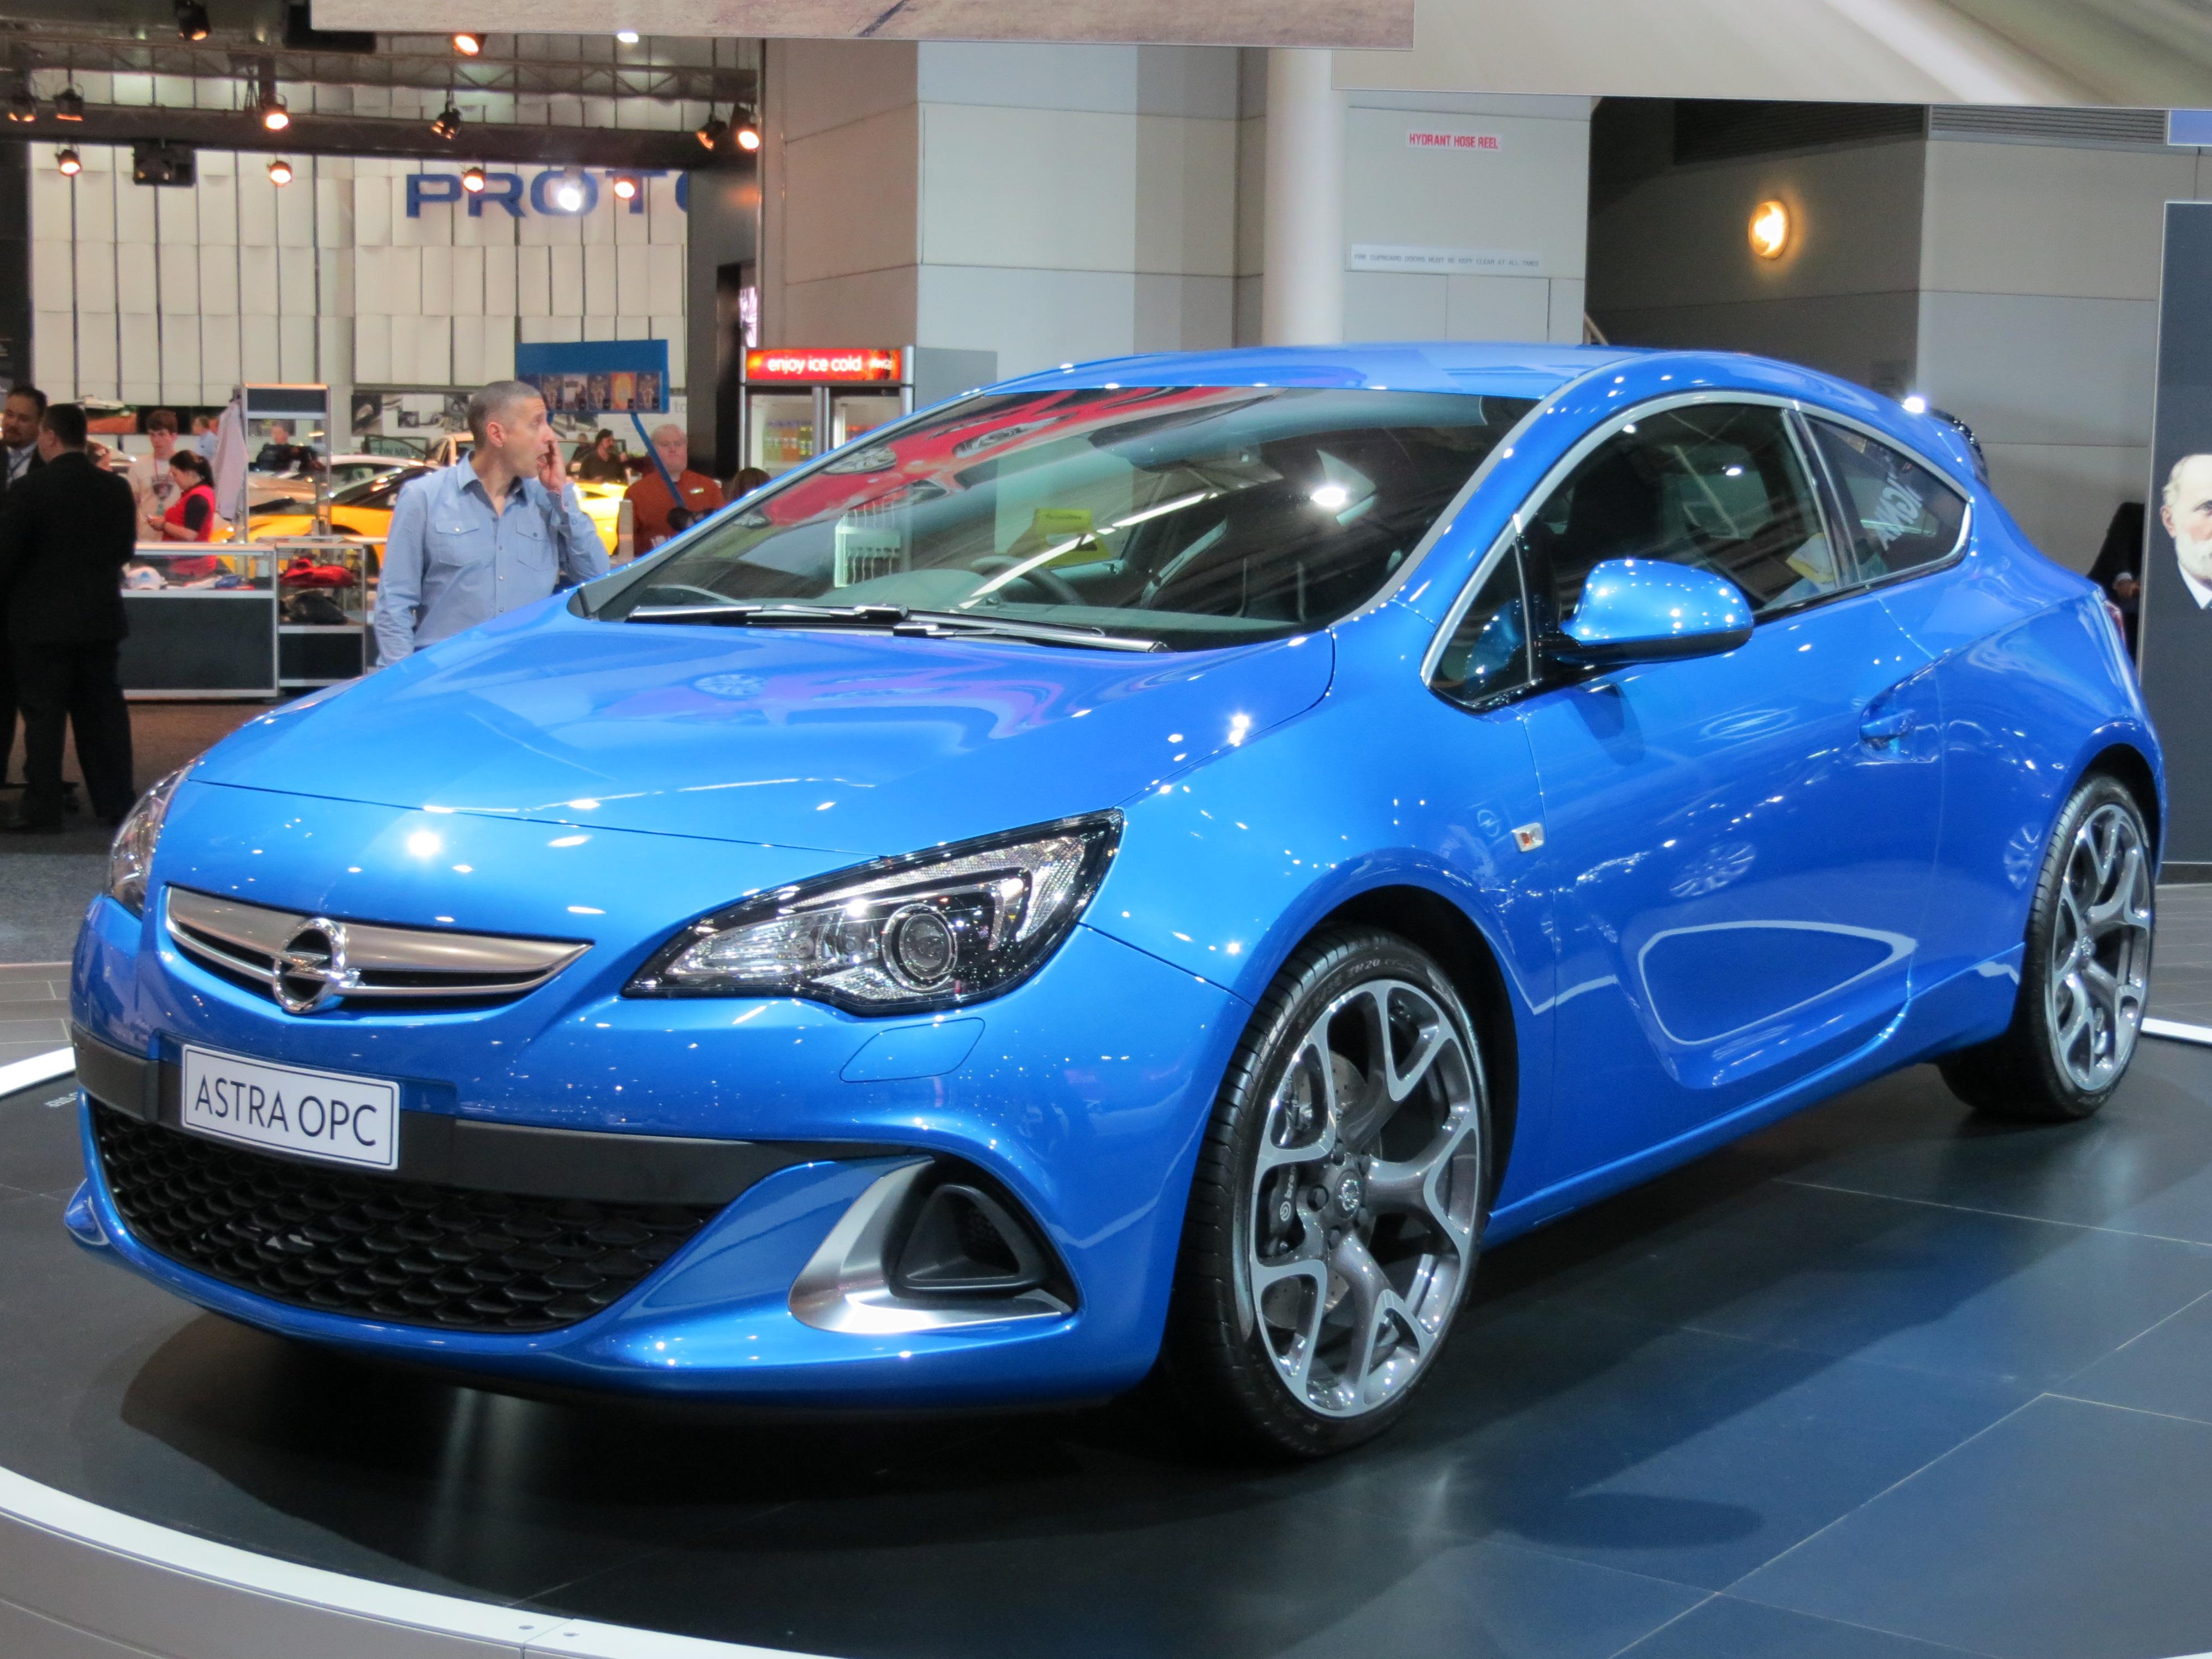 File:2012 Opel Astra (AS) OPC 3-door hatchback (2012- & File:2012 Opel Astra (AS) OPC 3-door hatchback (2012-10-26) 02.jpg ... Pezcame.Com